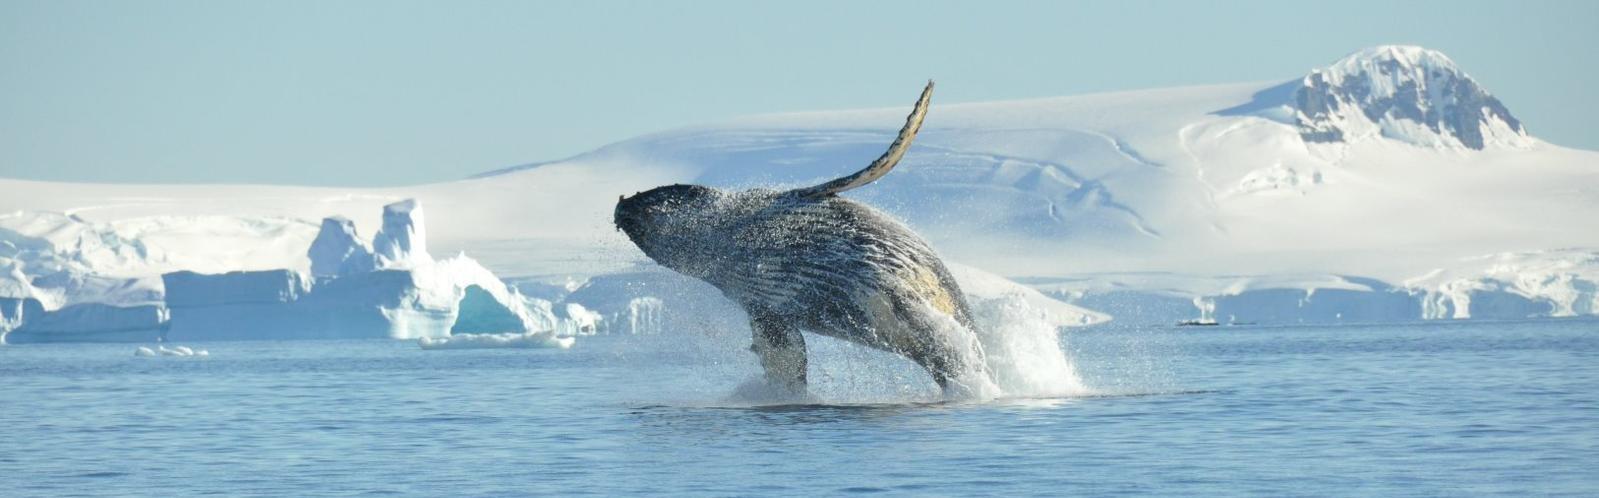 Humpback Whale breaching - Antarctica